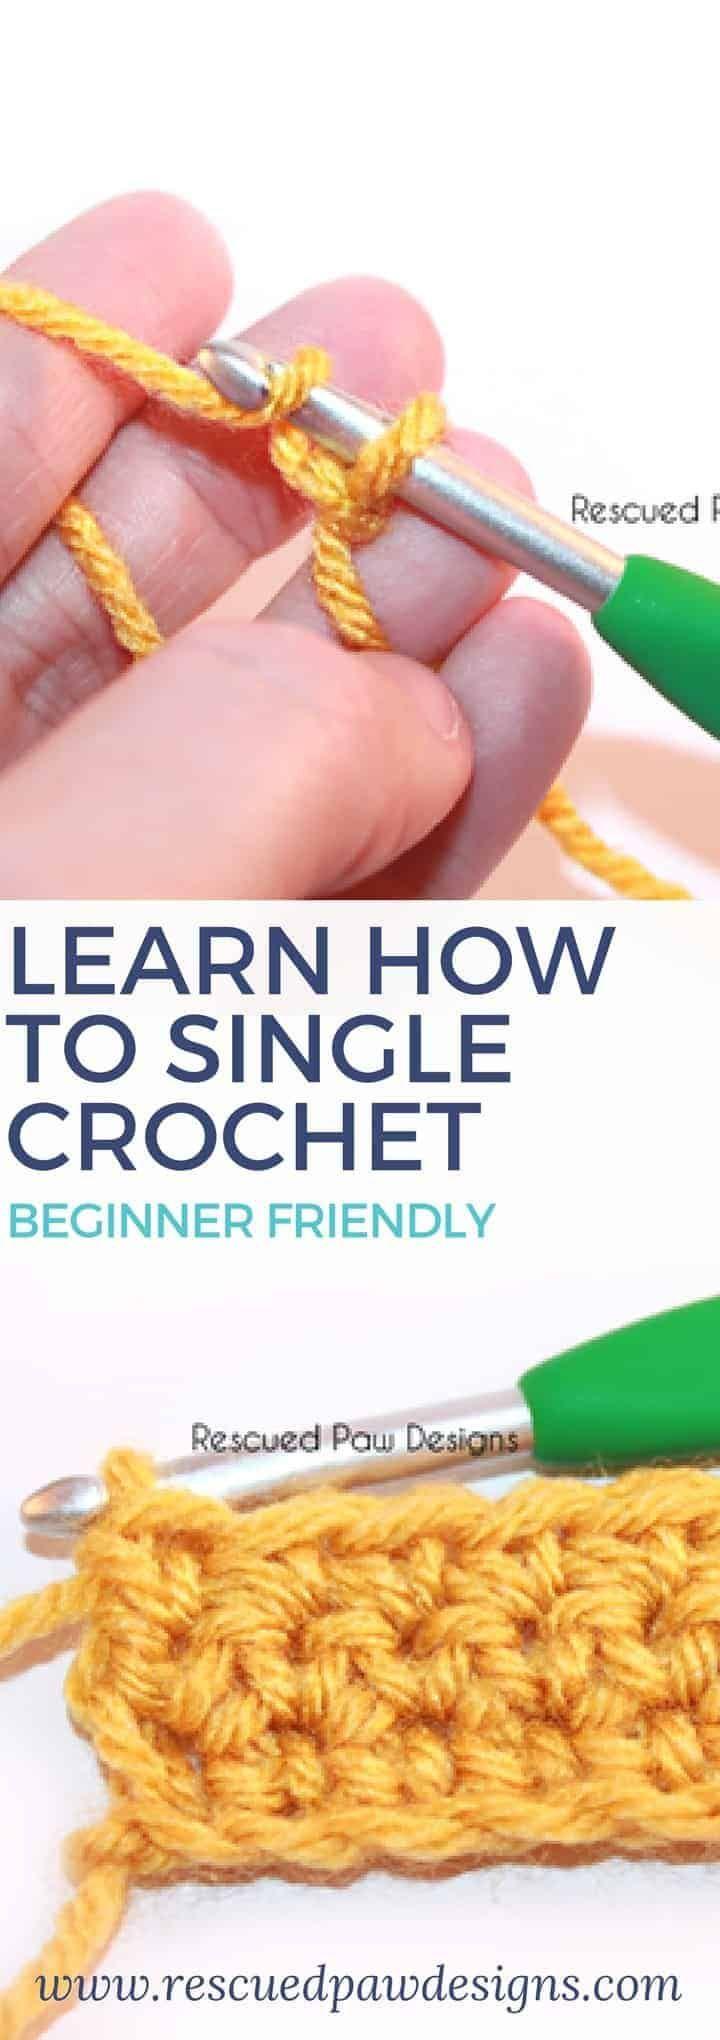 Single Crochet Stitch Tutorial - Easy Crochet #singlecrochet